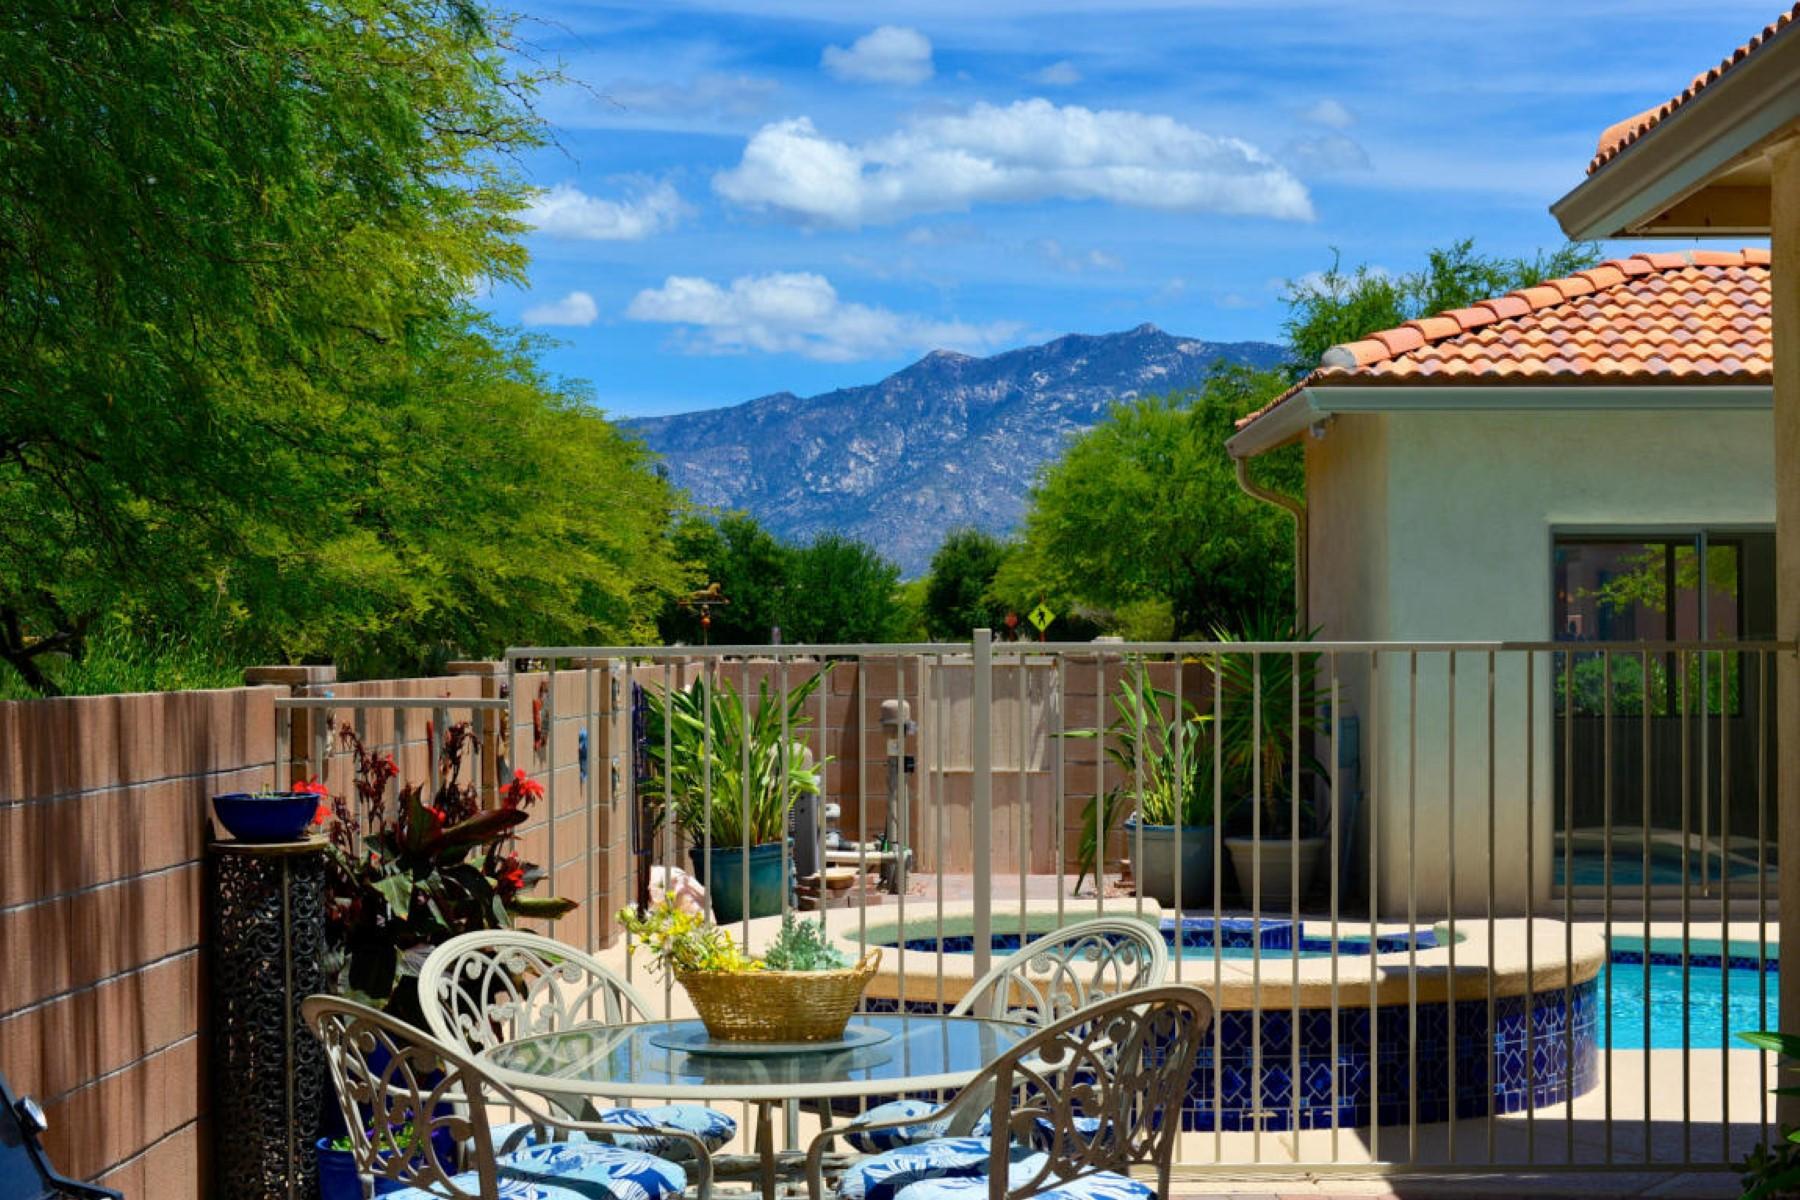 Moradia para Venda às Charming, private, serene, convenient and immaculate home 13117 N Vintage Drive Oro Valley, Arizona 85755 Estados Unidos